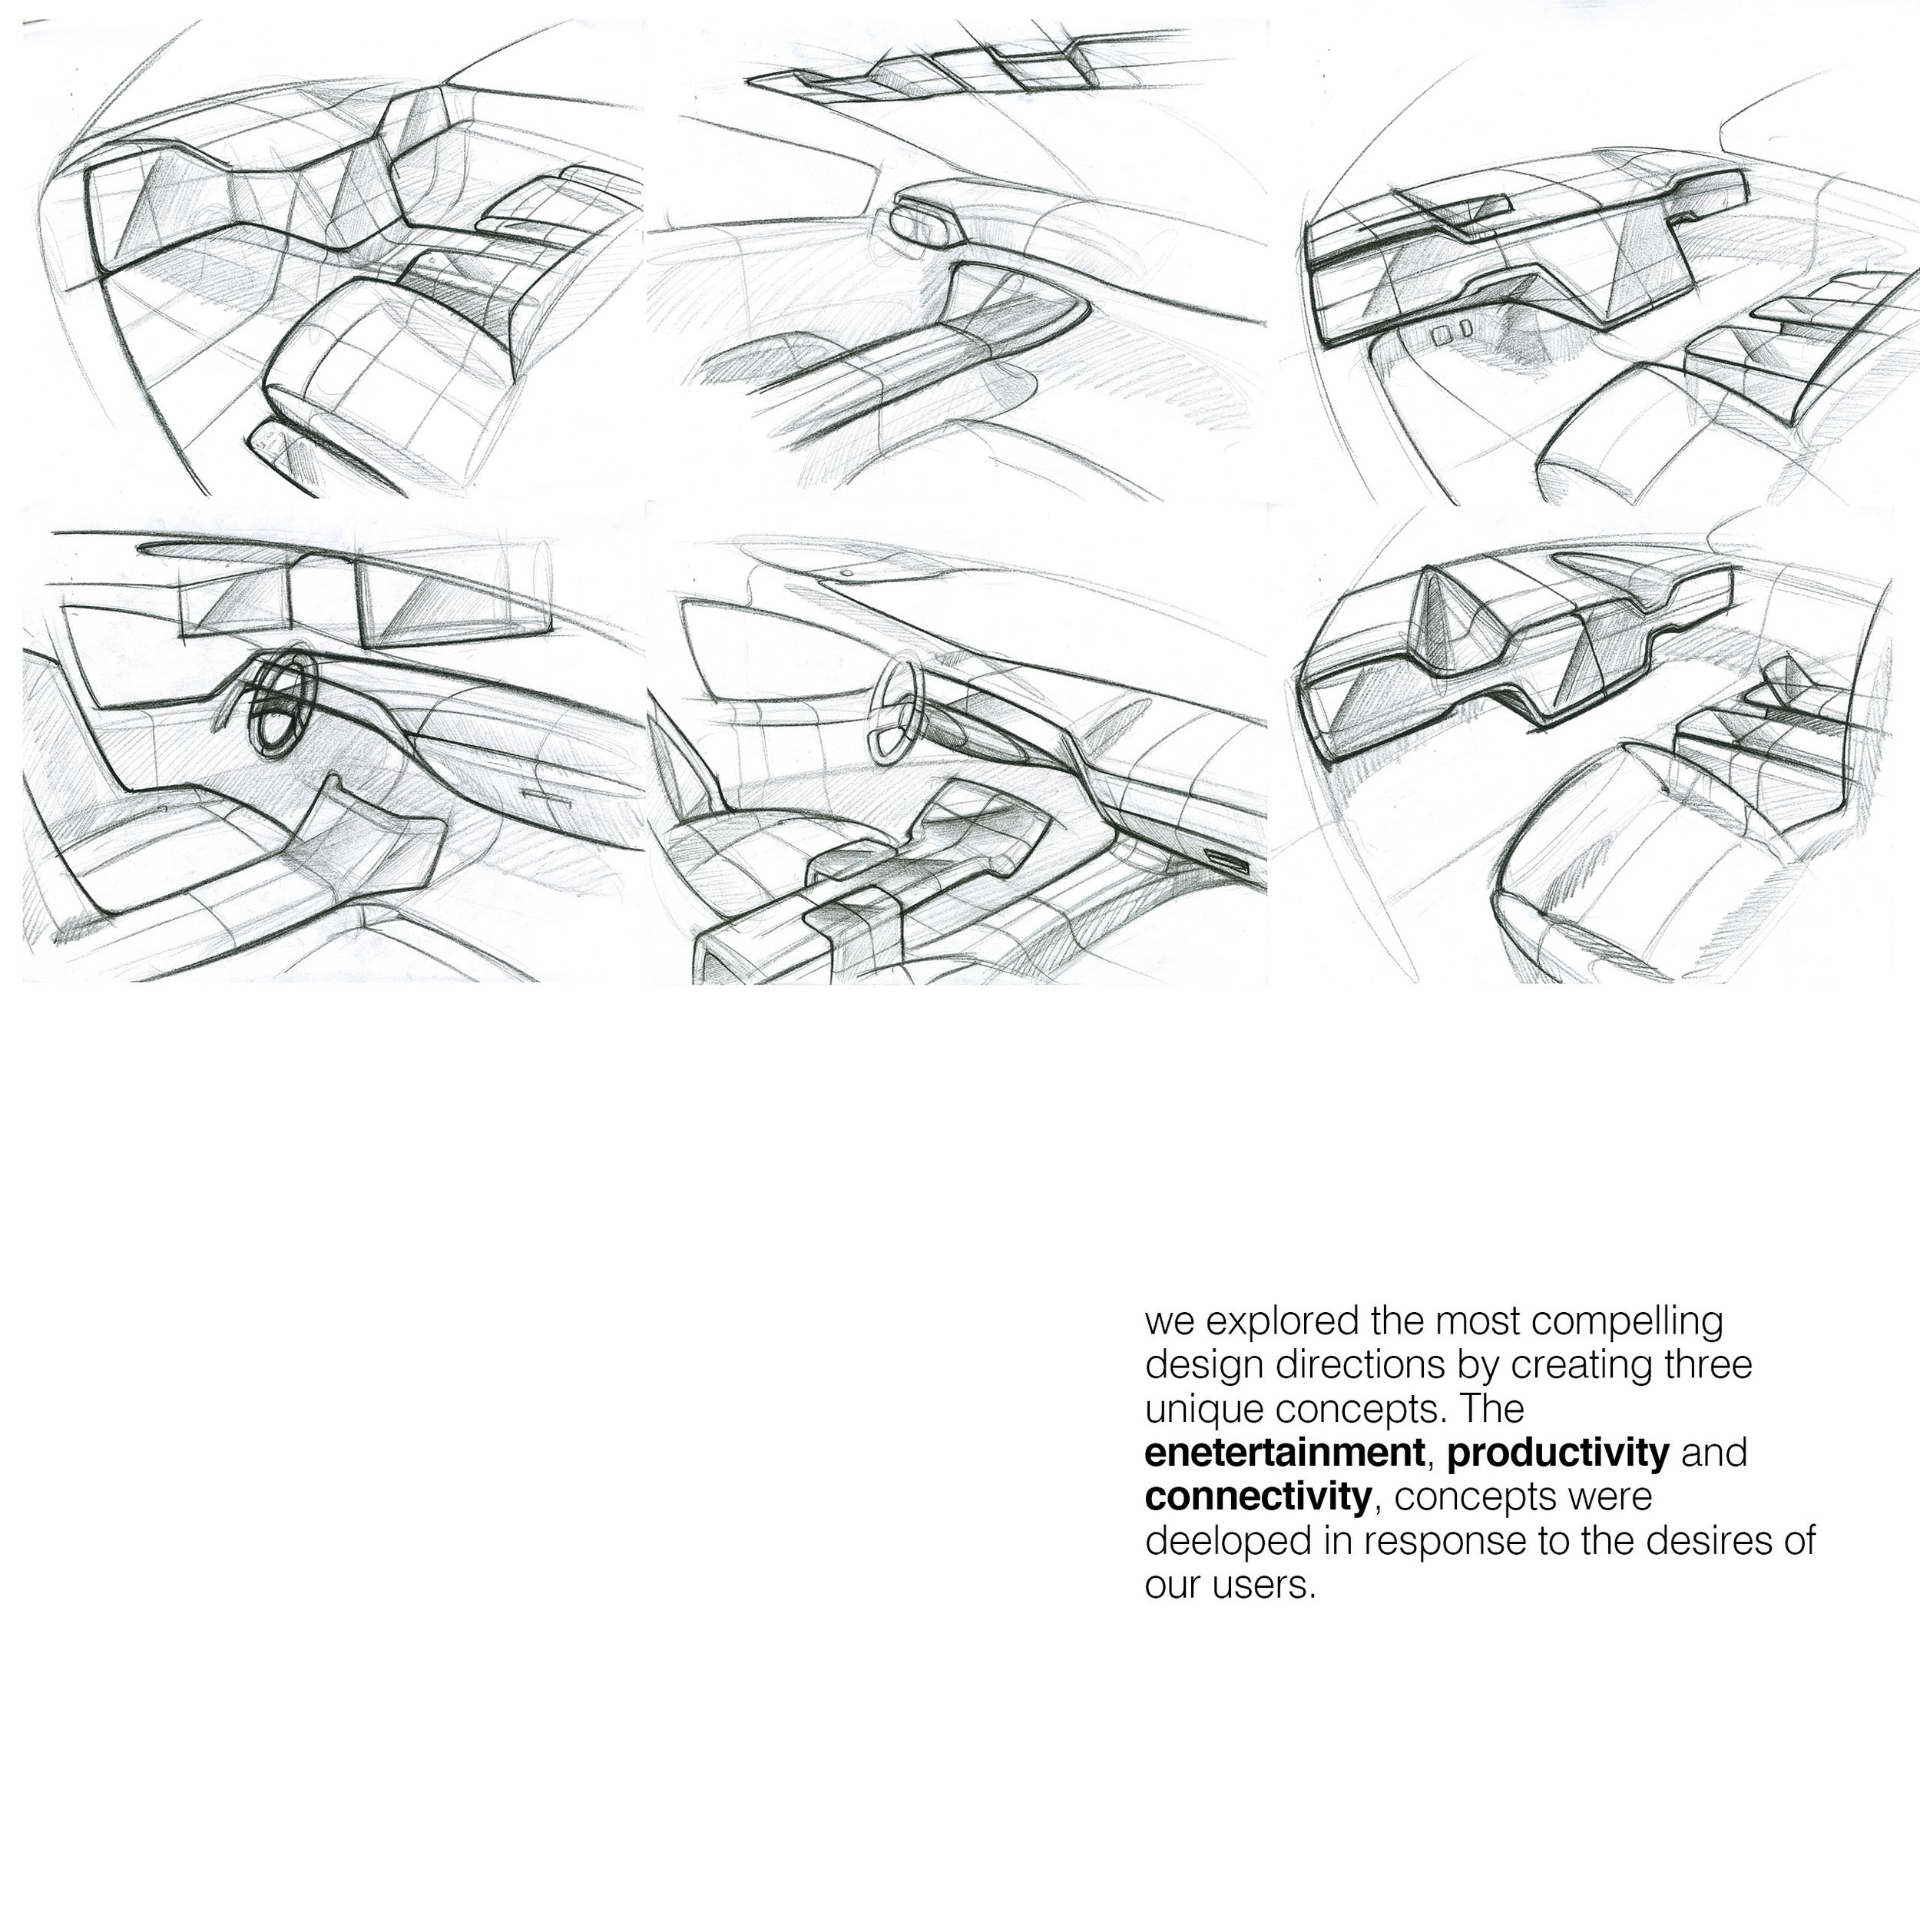 SamsungProjectArtboard 1 copy 21.jpg